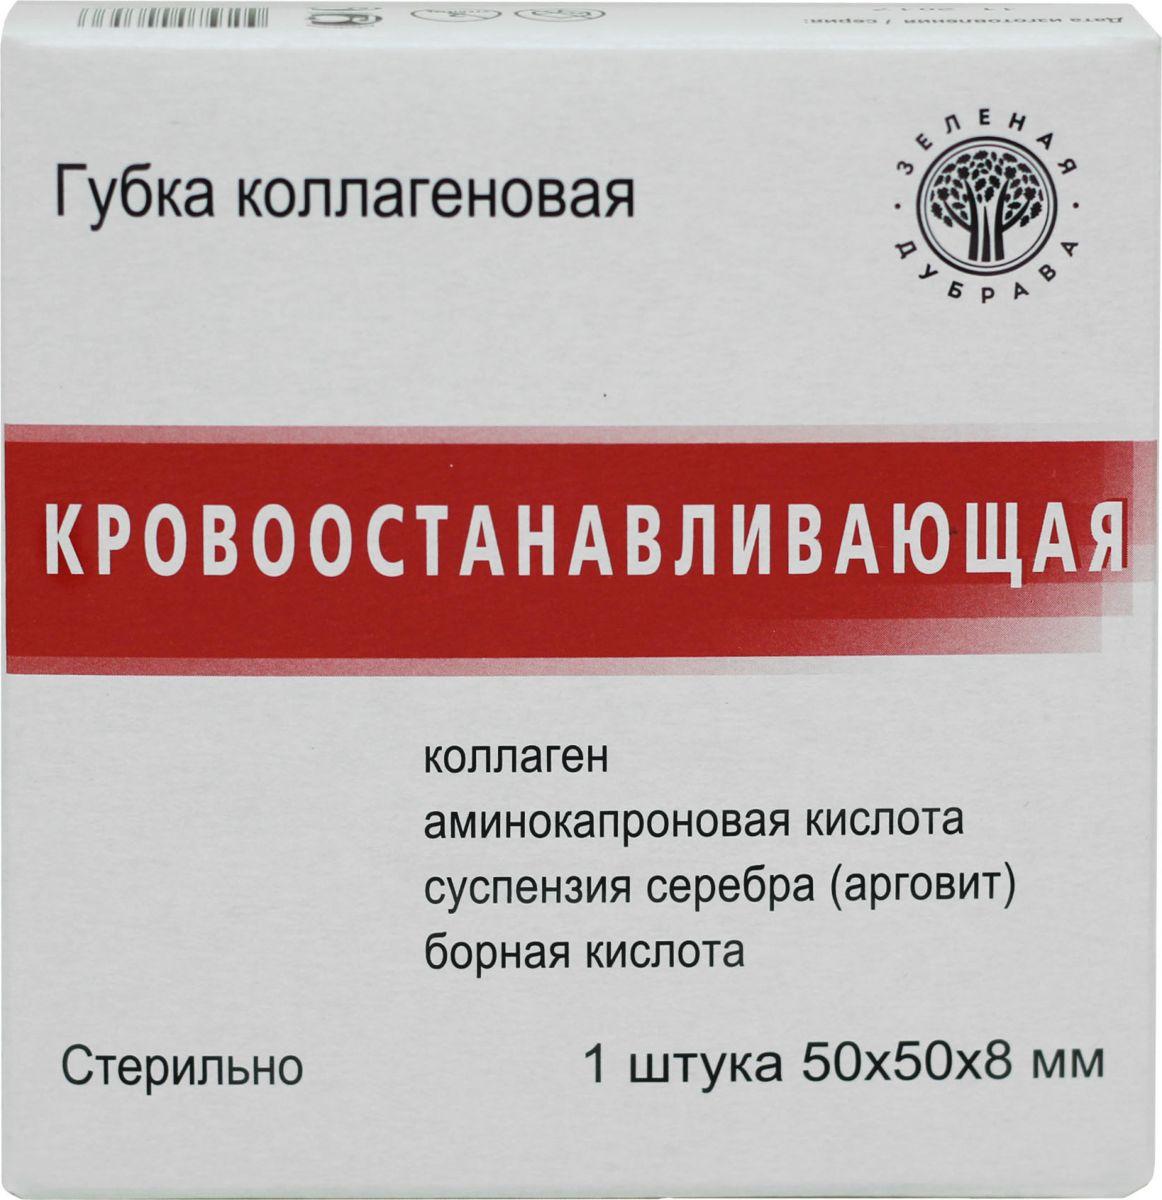 Губка коллагеновая кровоостанавливающая 50 х 50 мм губка коллагеновая кровоостанавливающая 5х5см 1